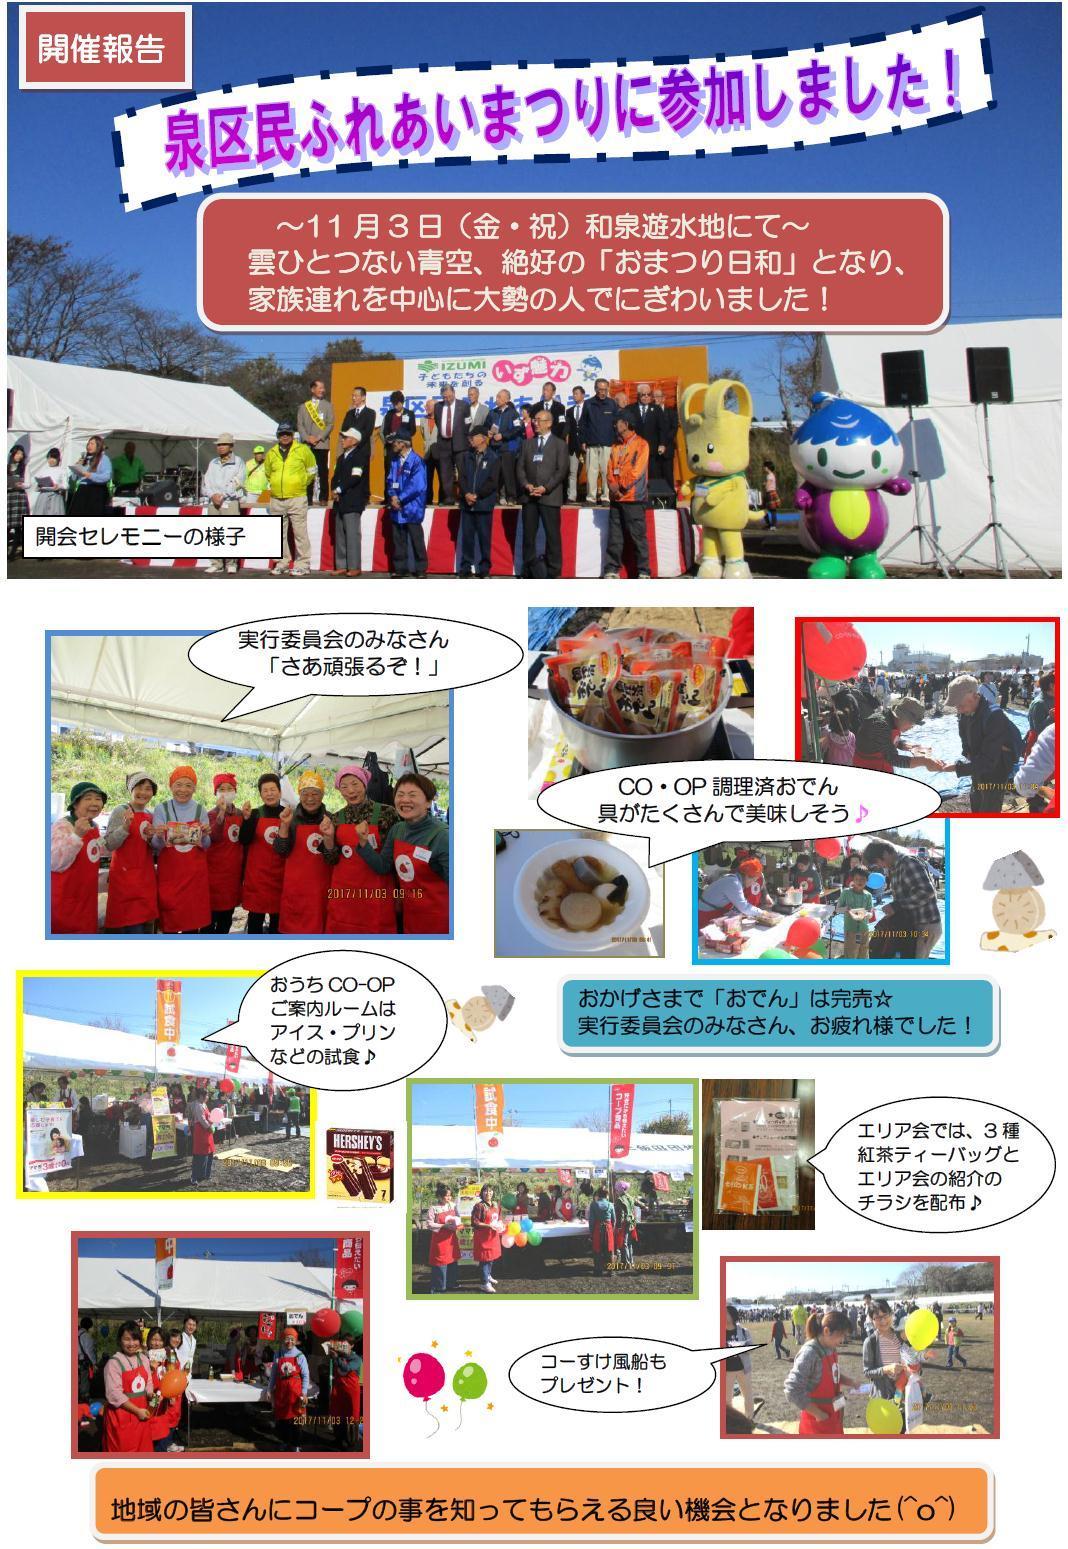 http://kanagawa.ucoop.or.jp/hiroba/areanews/files/naka2%2020171103.jpg